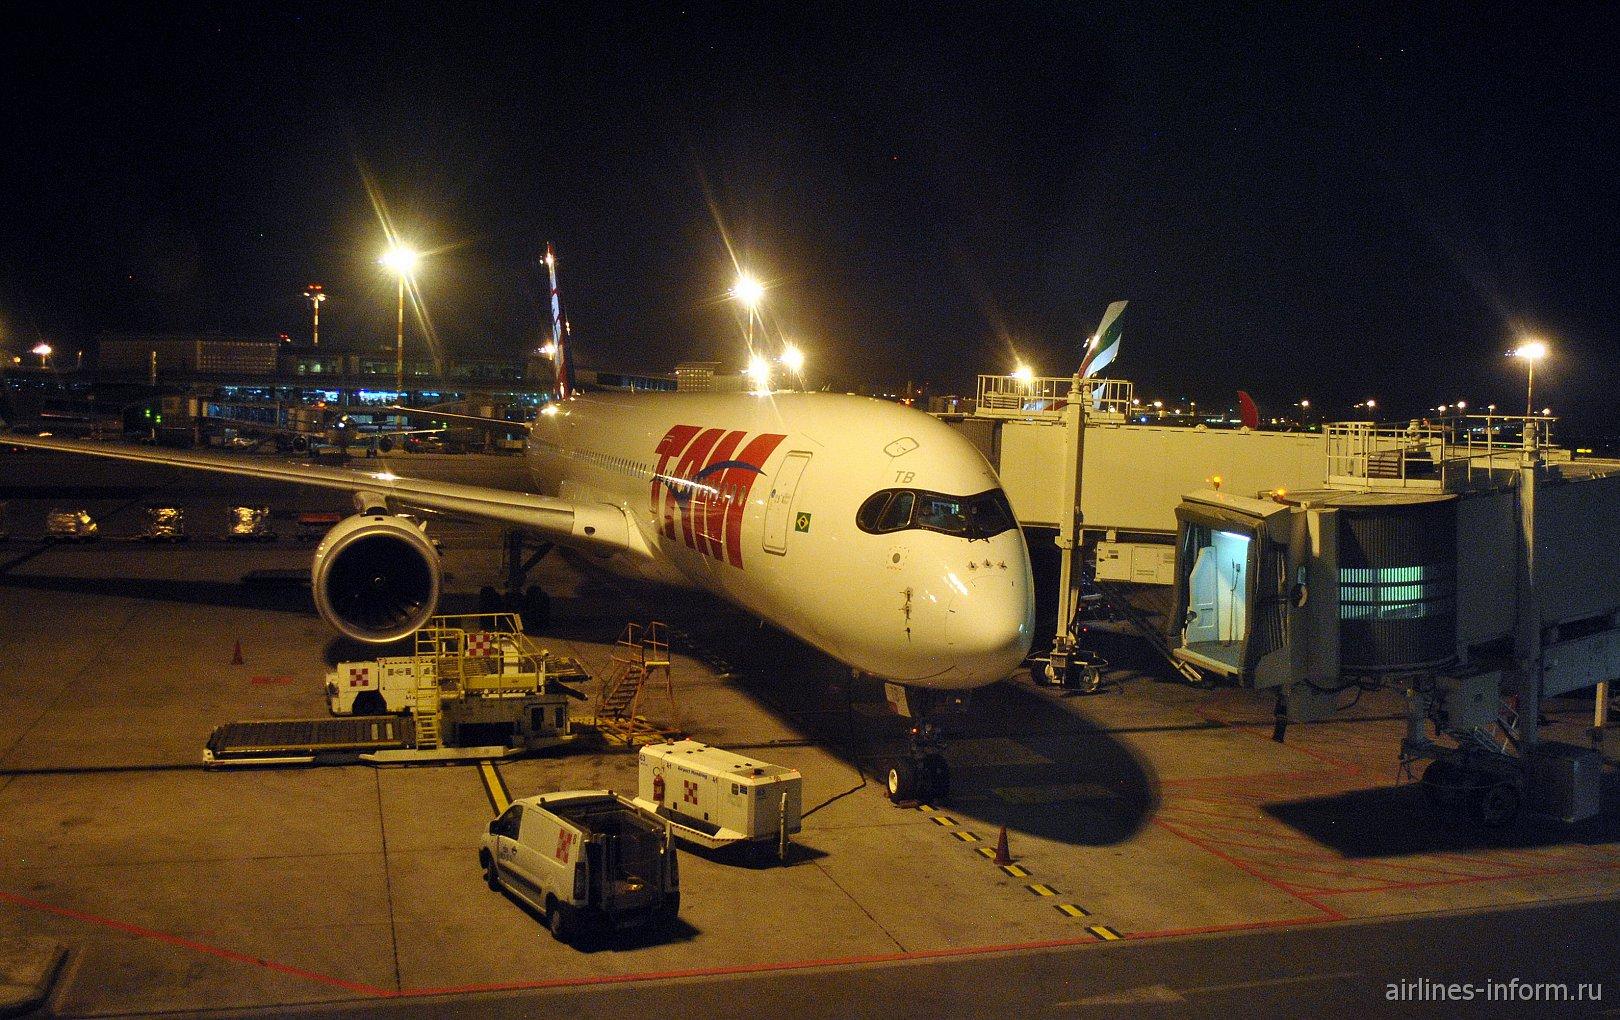 """Memories Of The Future"": Милан Мальпенса (MXP/T1) - Сан-Паулу Гуарульос (GRU/T3) LATAM Brasil LA8063 (JJ8063) на Airbus A350-900XWB"